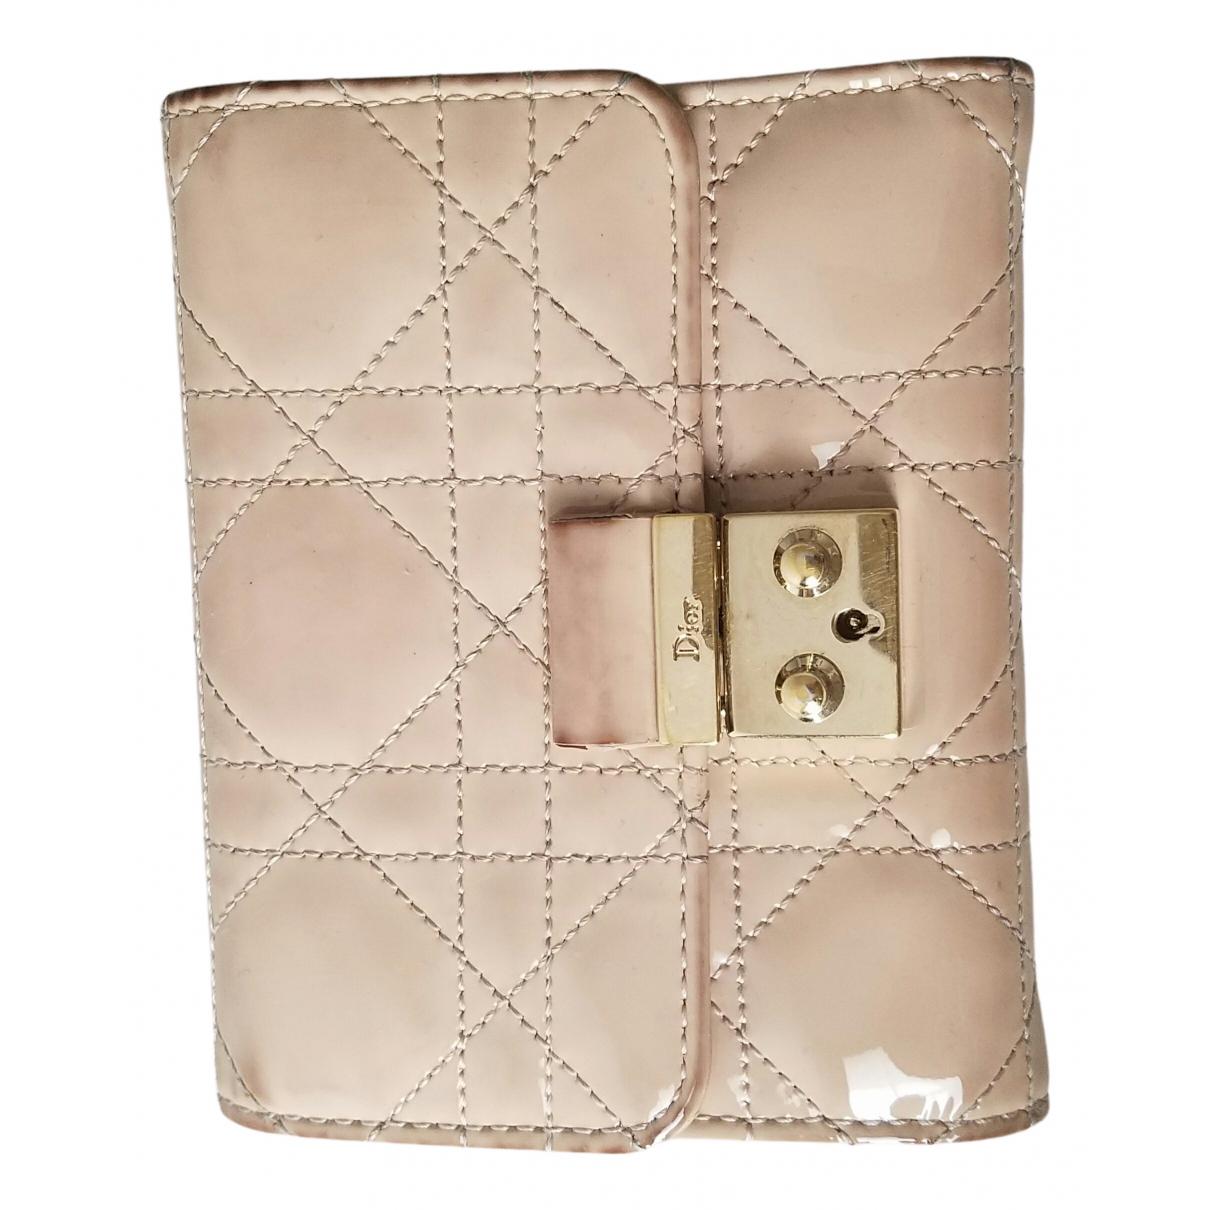 Dior \N Portemonnaie in  Beige Lackleder